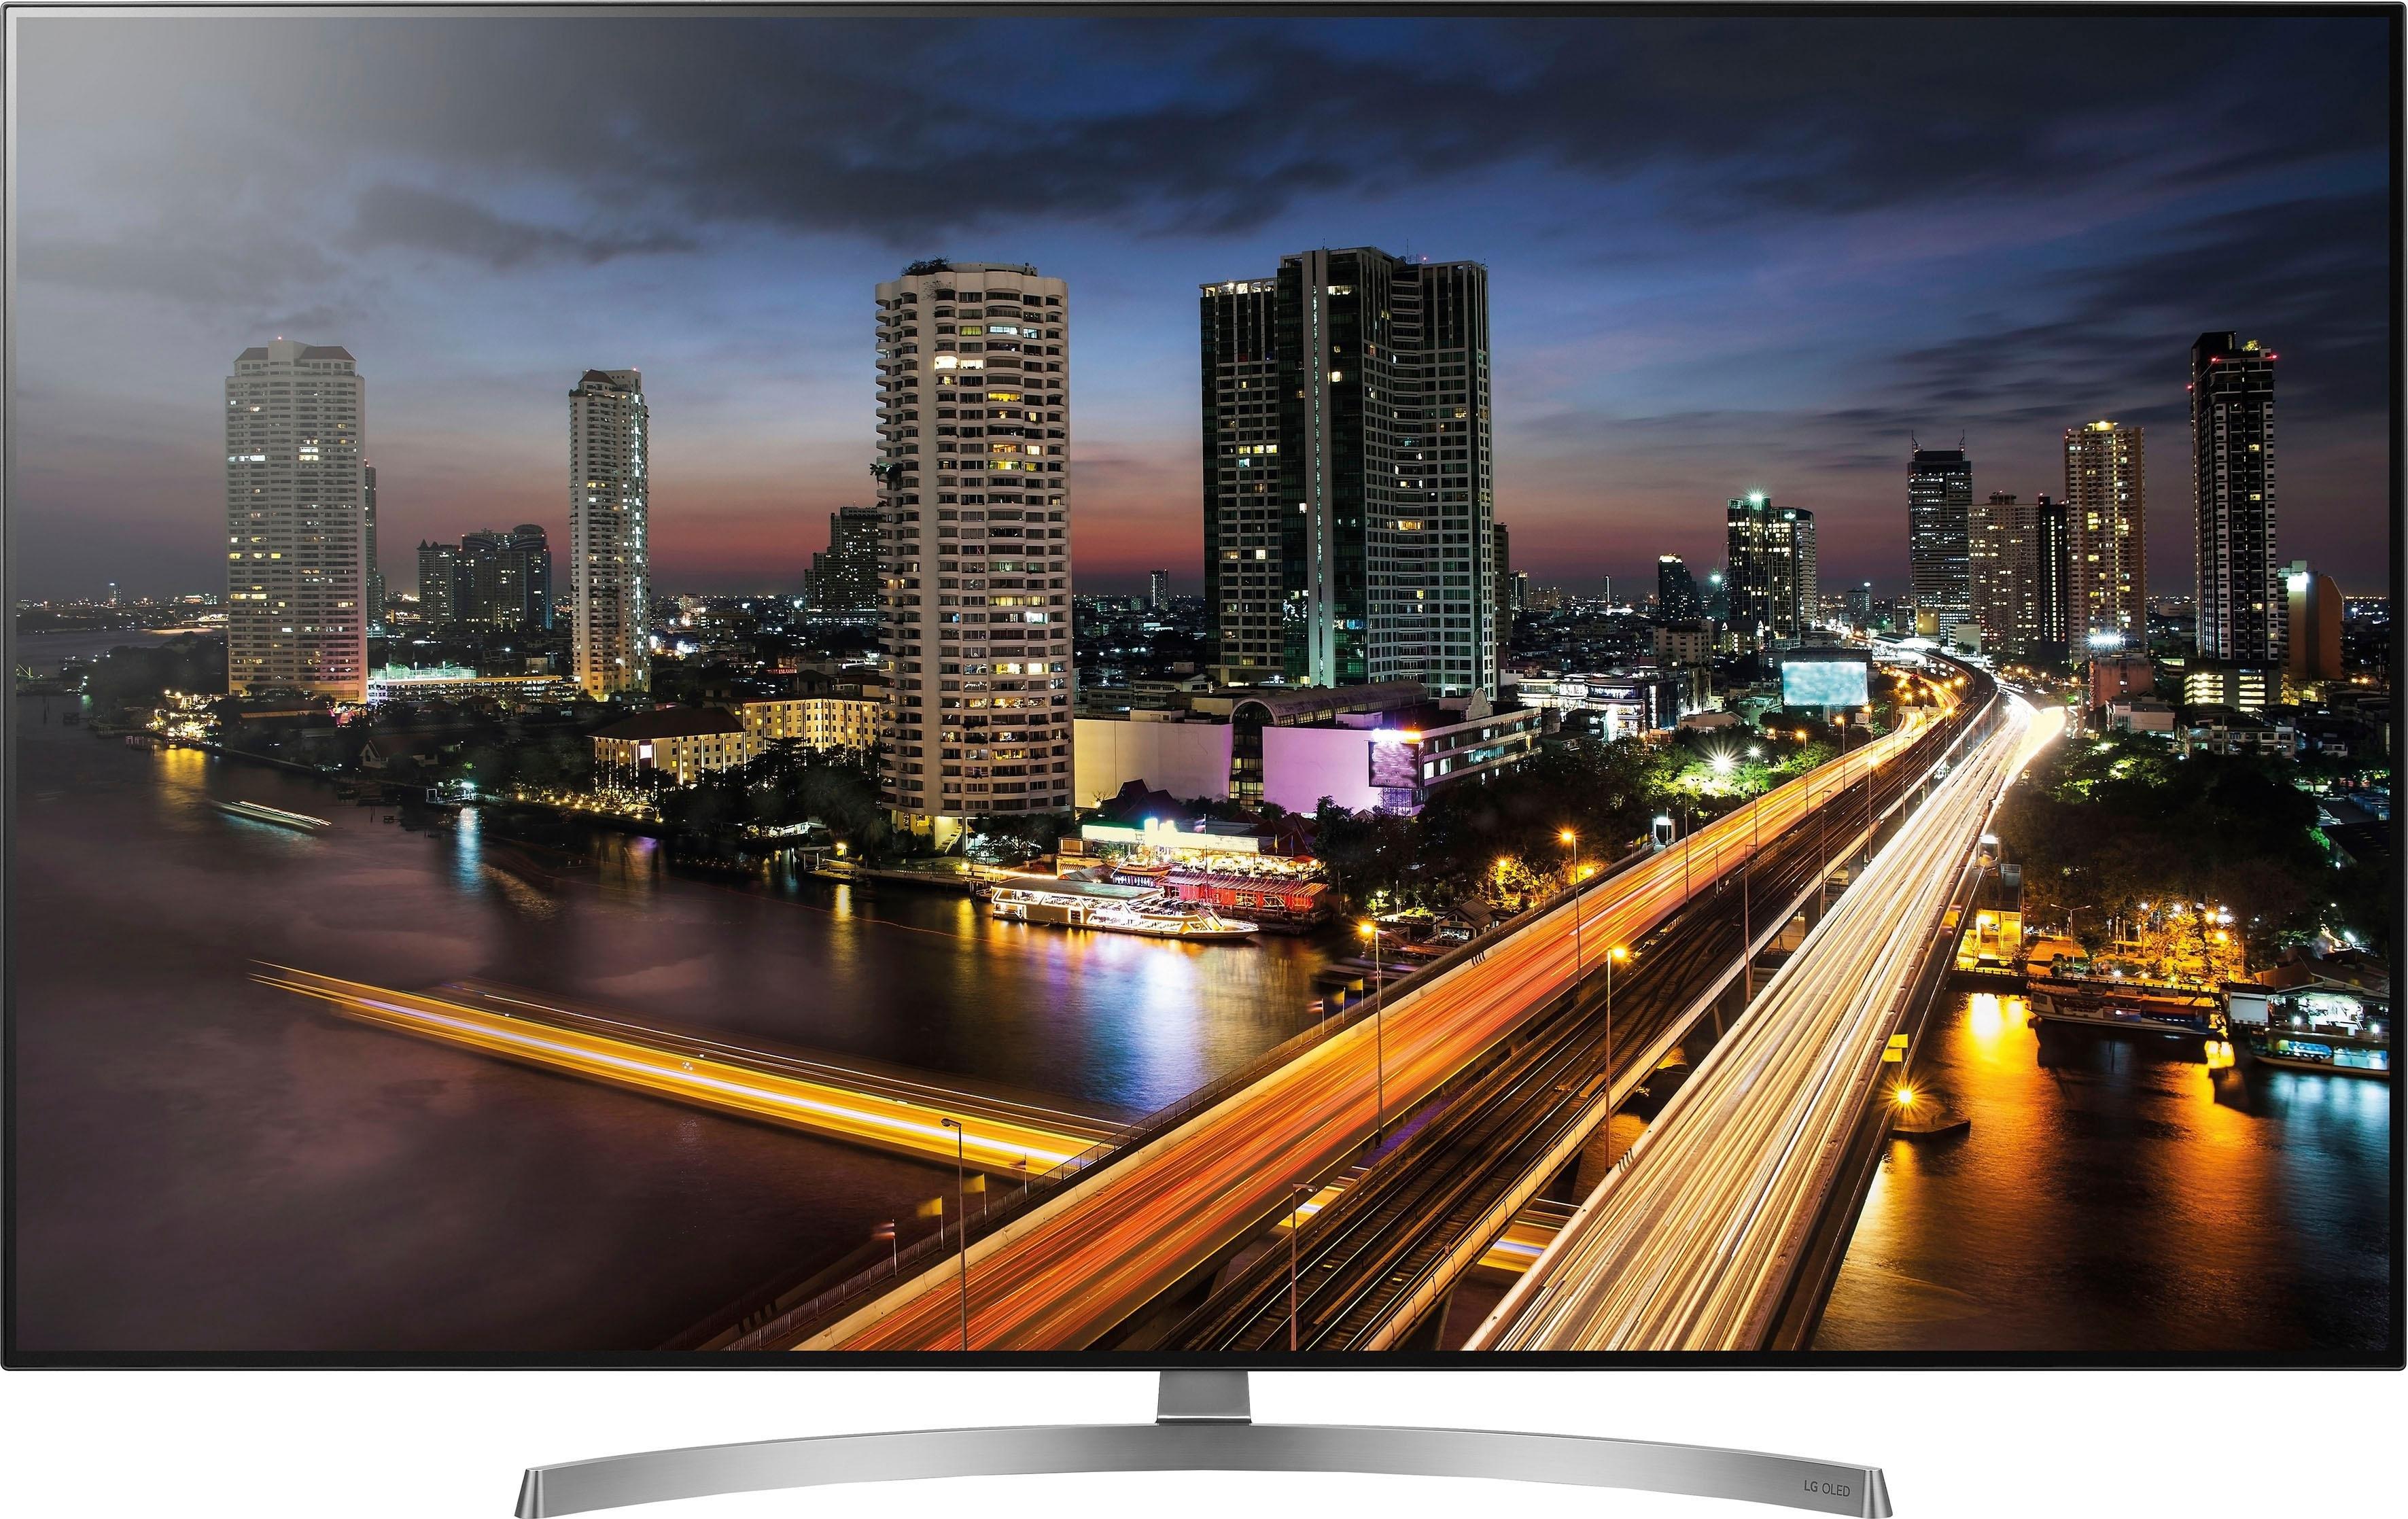 LG Oled65B87LC oled-tv (164 cm / (65 inch)), 4K Ultra HD, smart-tv bestellen: 14 dagen bedenktijd